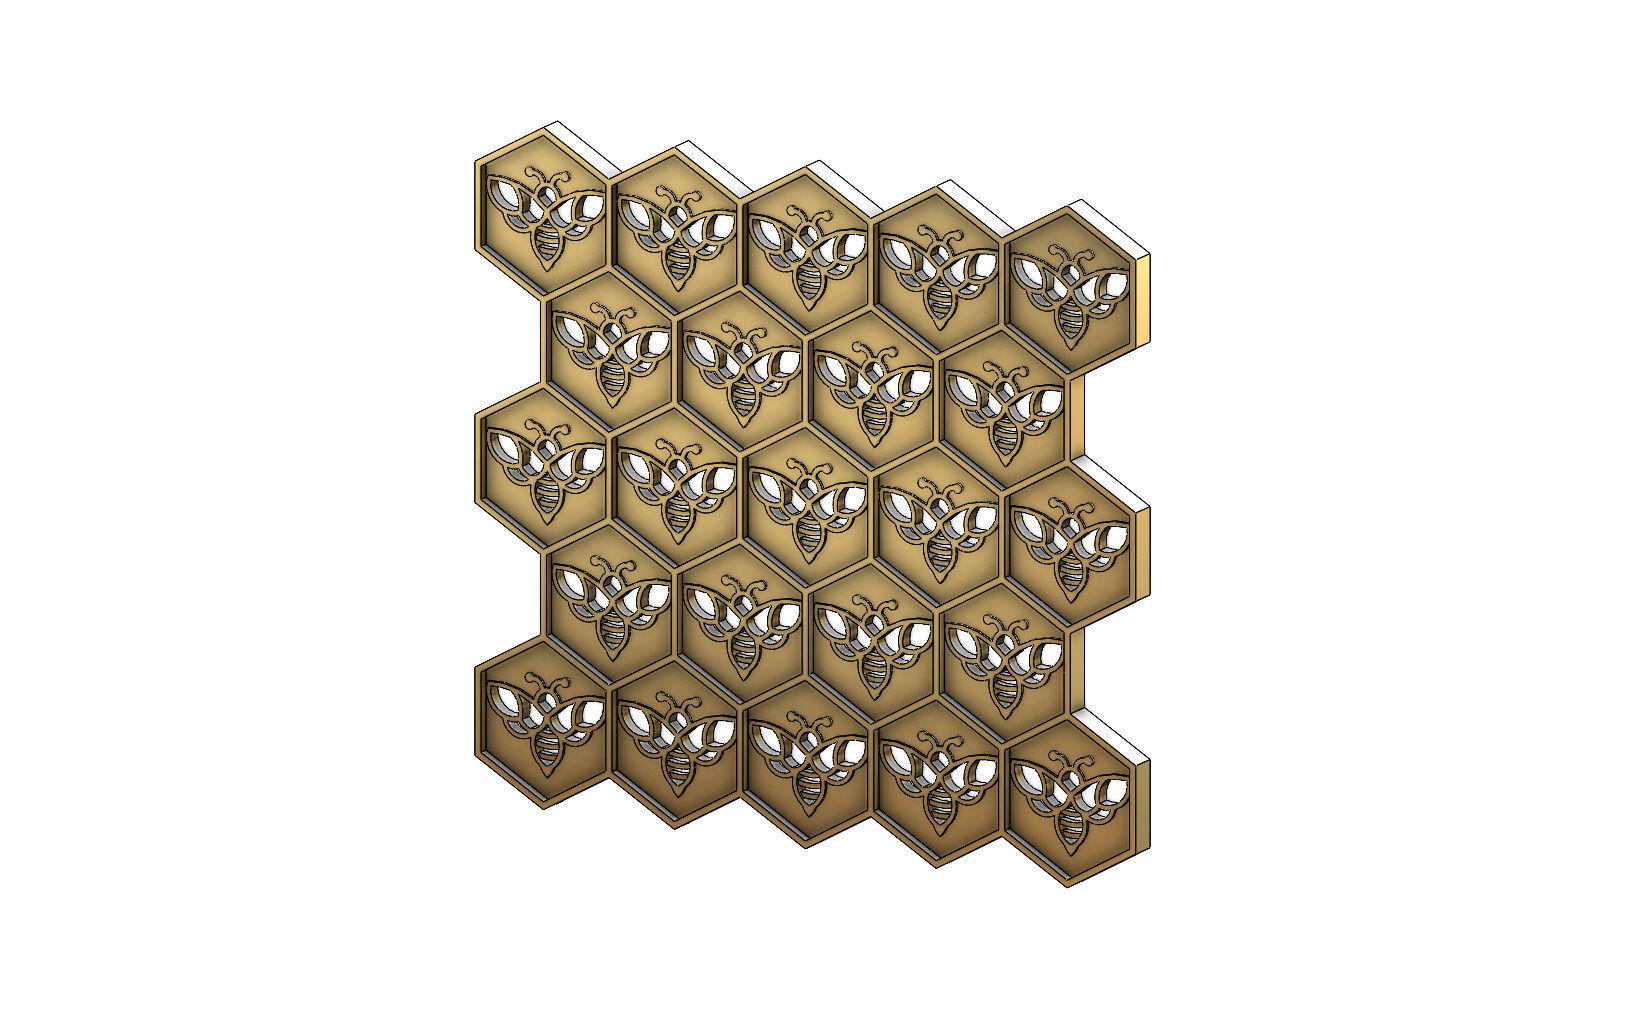 Beehive motif panel for 3dprinting